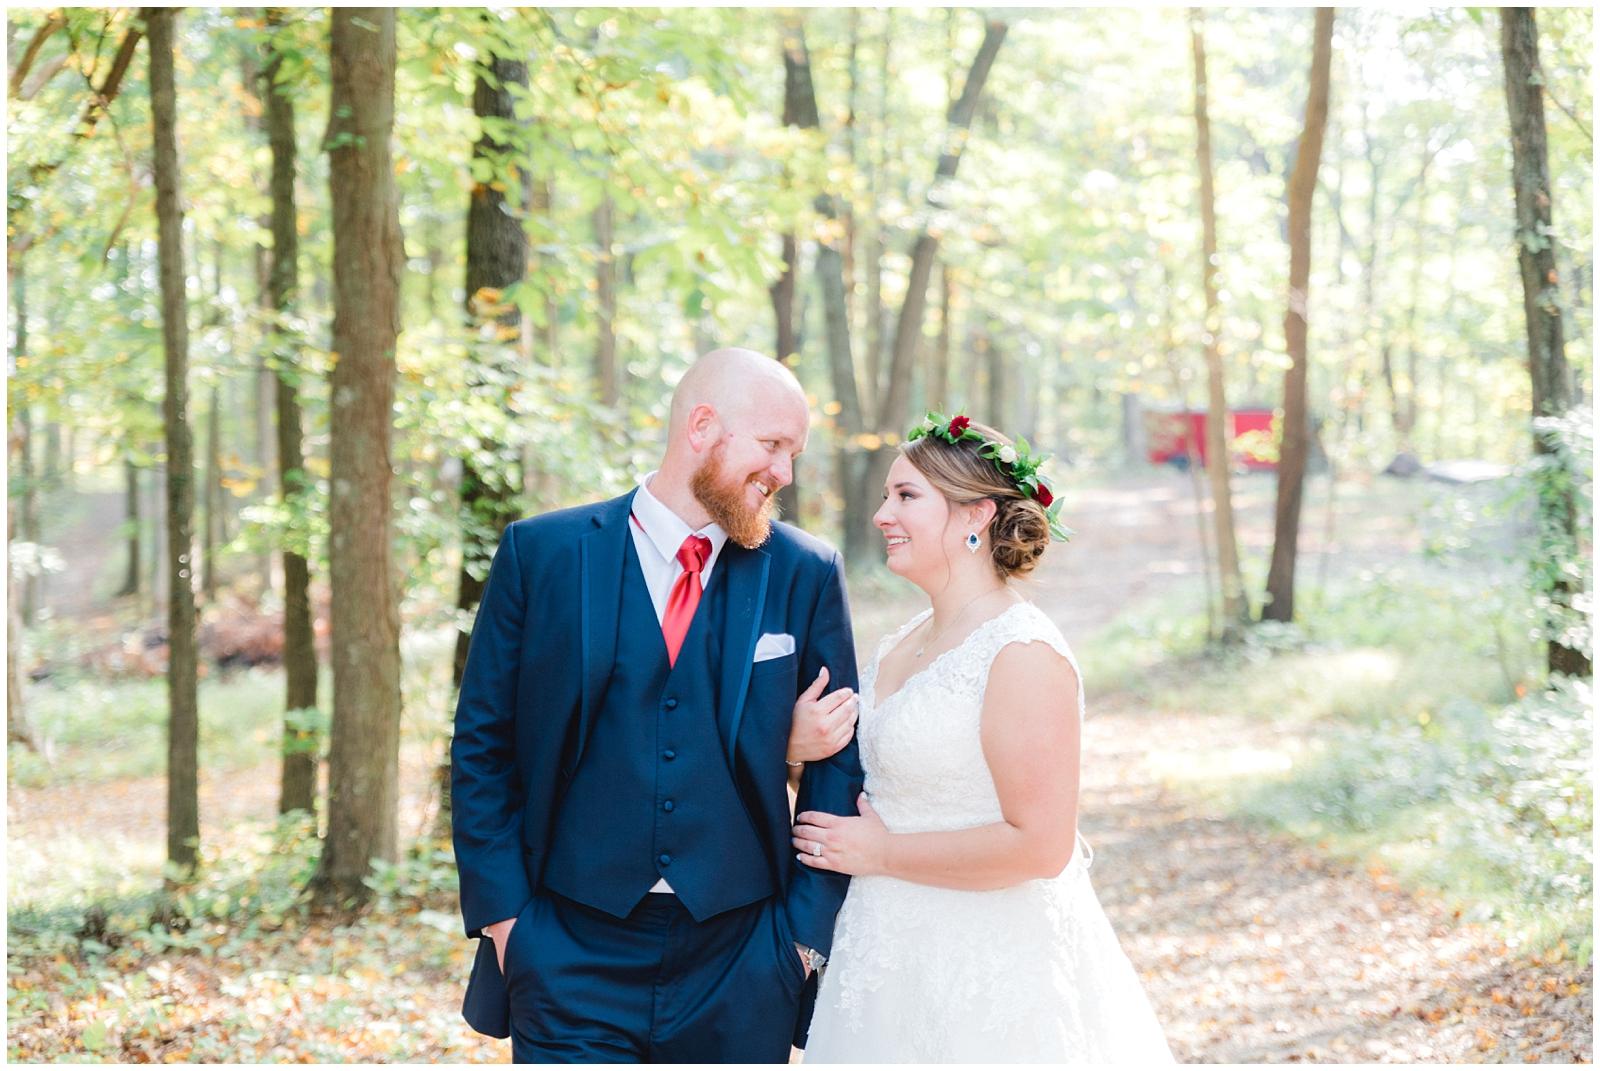 lancaster-ohio-fall-wedding-lra-photo_0022.jpg